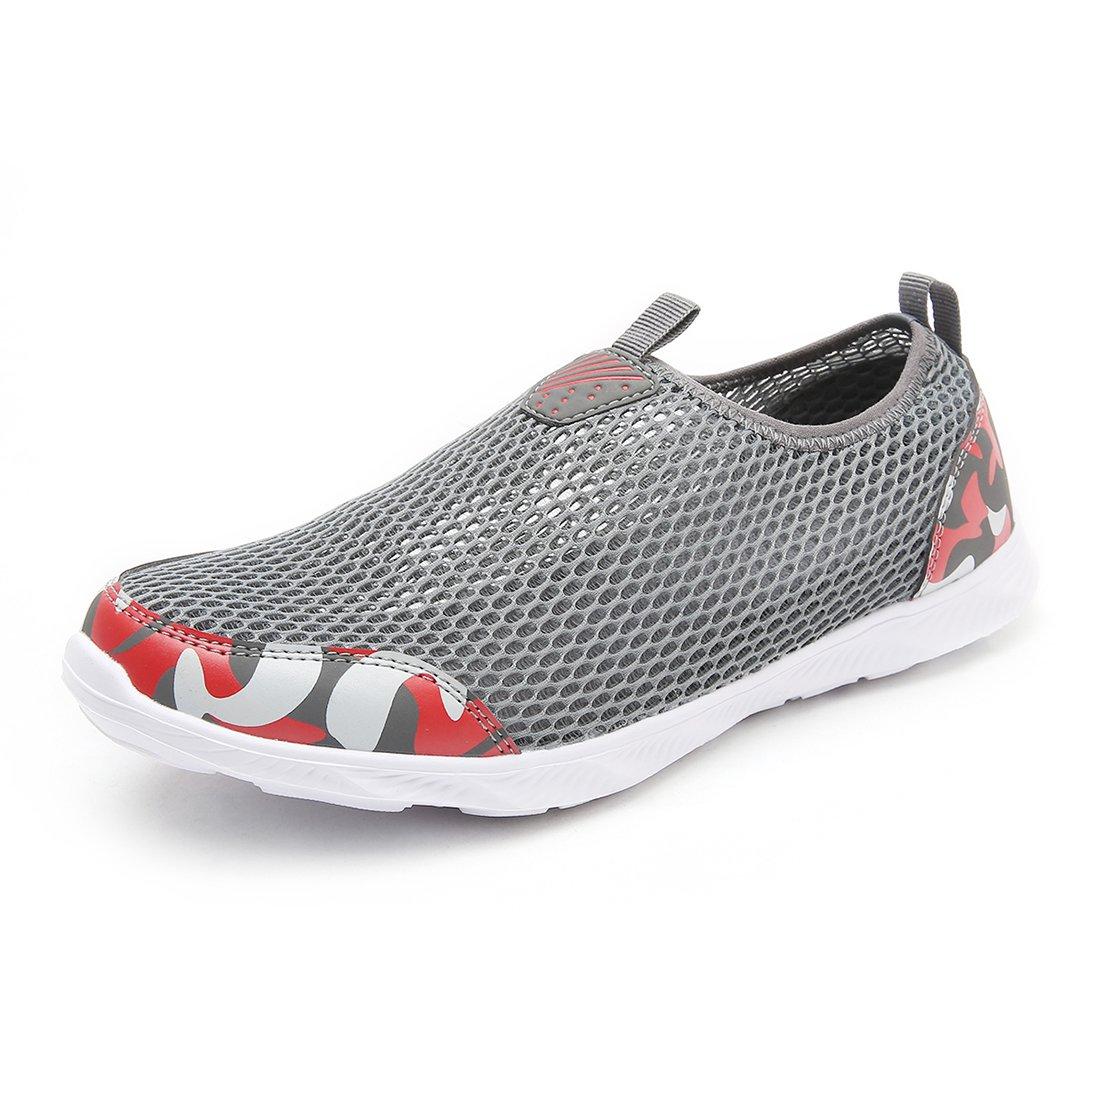 HOBIBEAR Men Women Quick Dry Water Shoes Lightweight Slip-on Aqua Sneakers for Walking Boating Sailing Running B07BJJDNCB 7.5 D(M)US Men/8.5 D(M)US Women|Camouflage/Grey